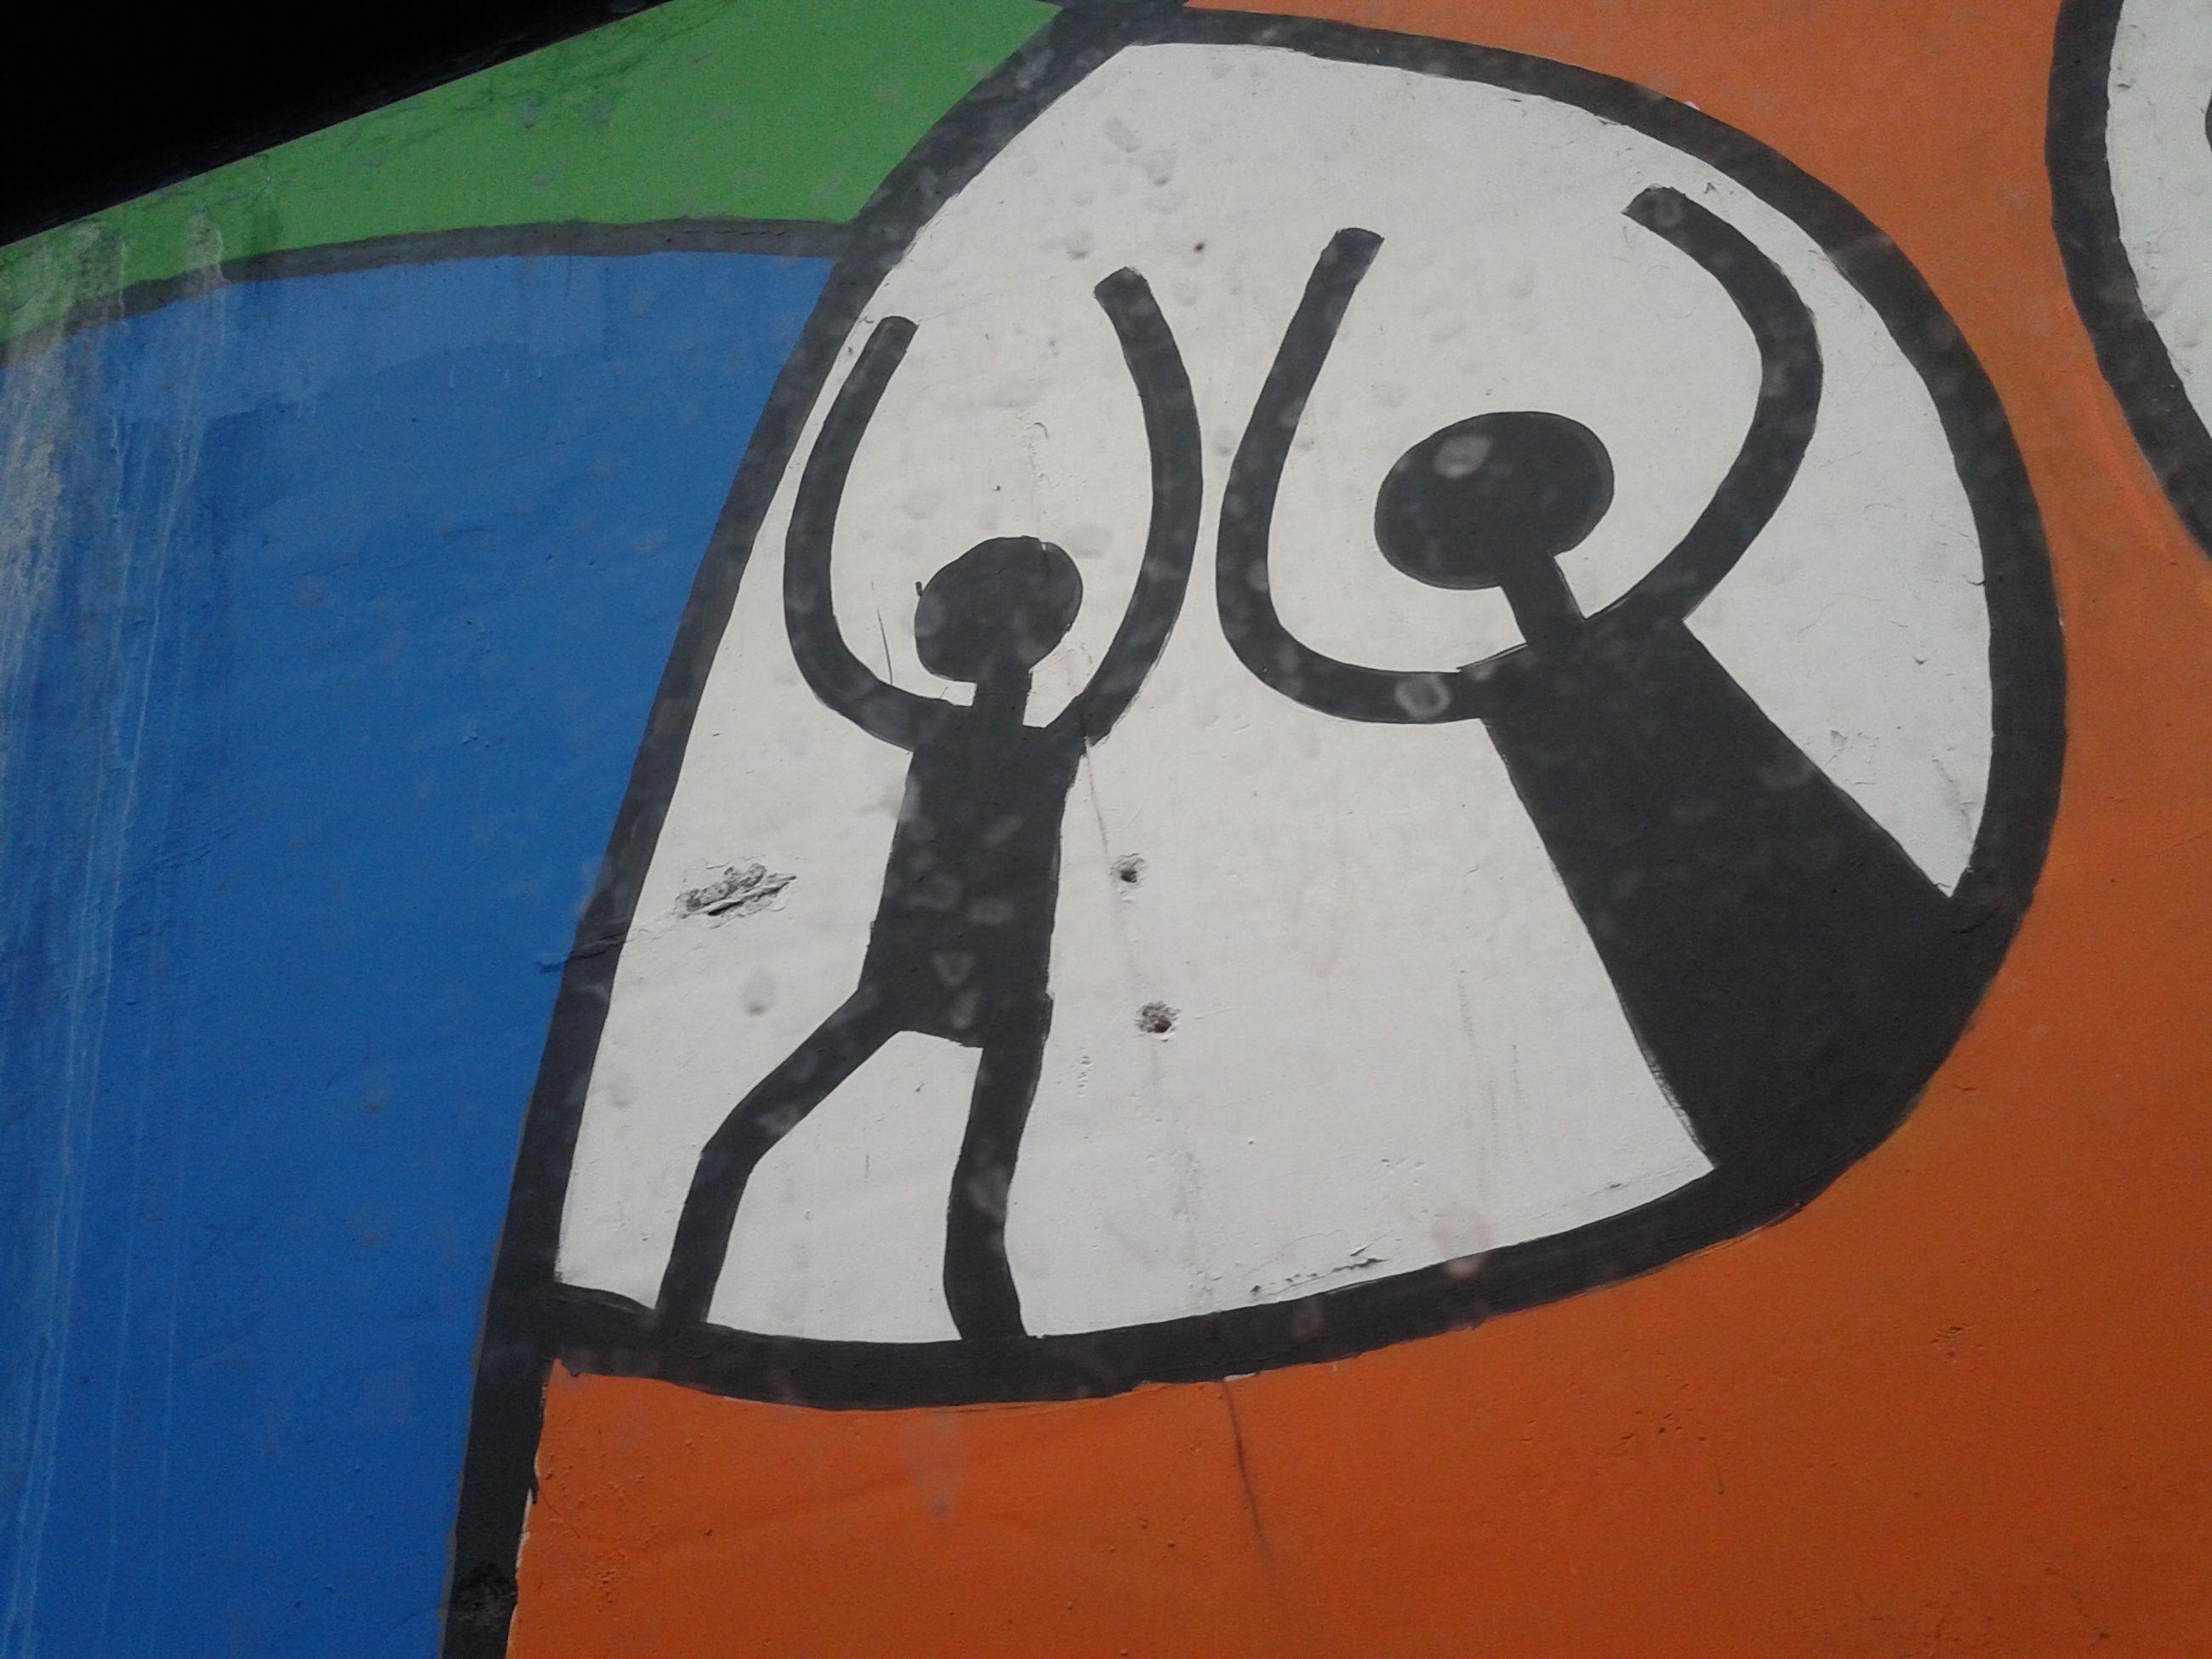 close-up, communication, street, graffiti, symbol, outdoors, message, blue, creativity, geometric shape, circle